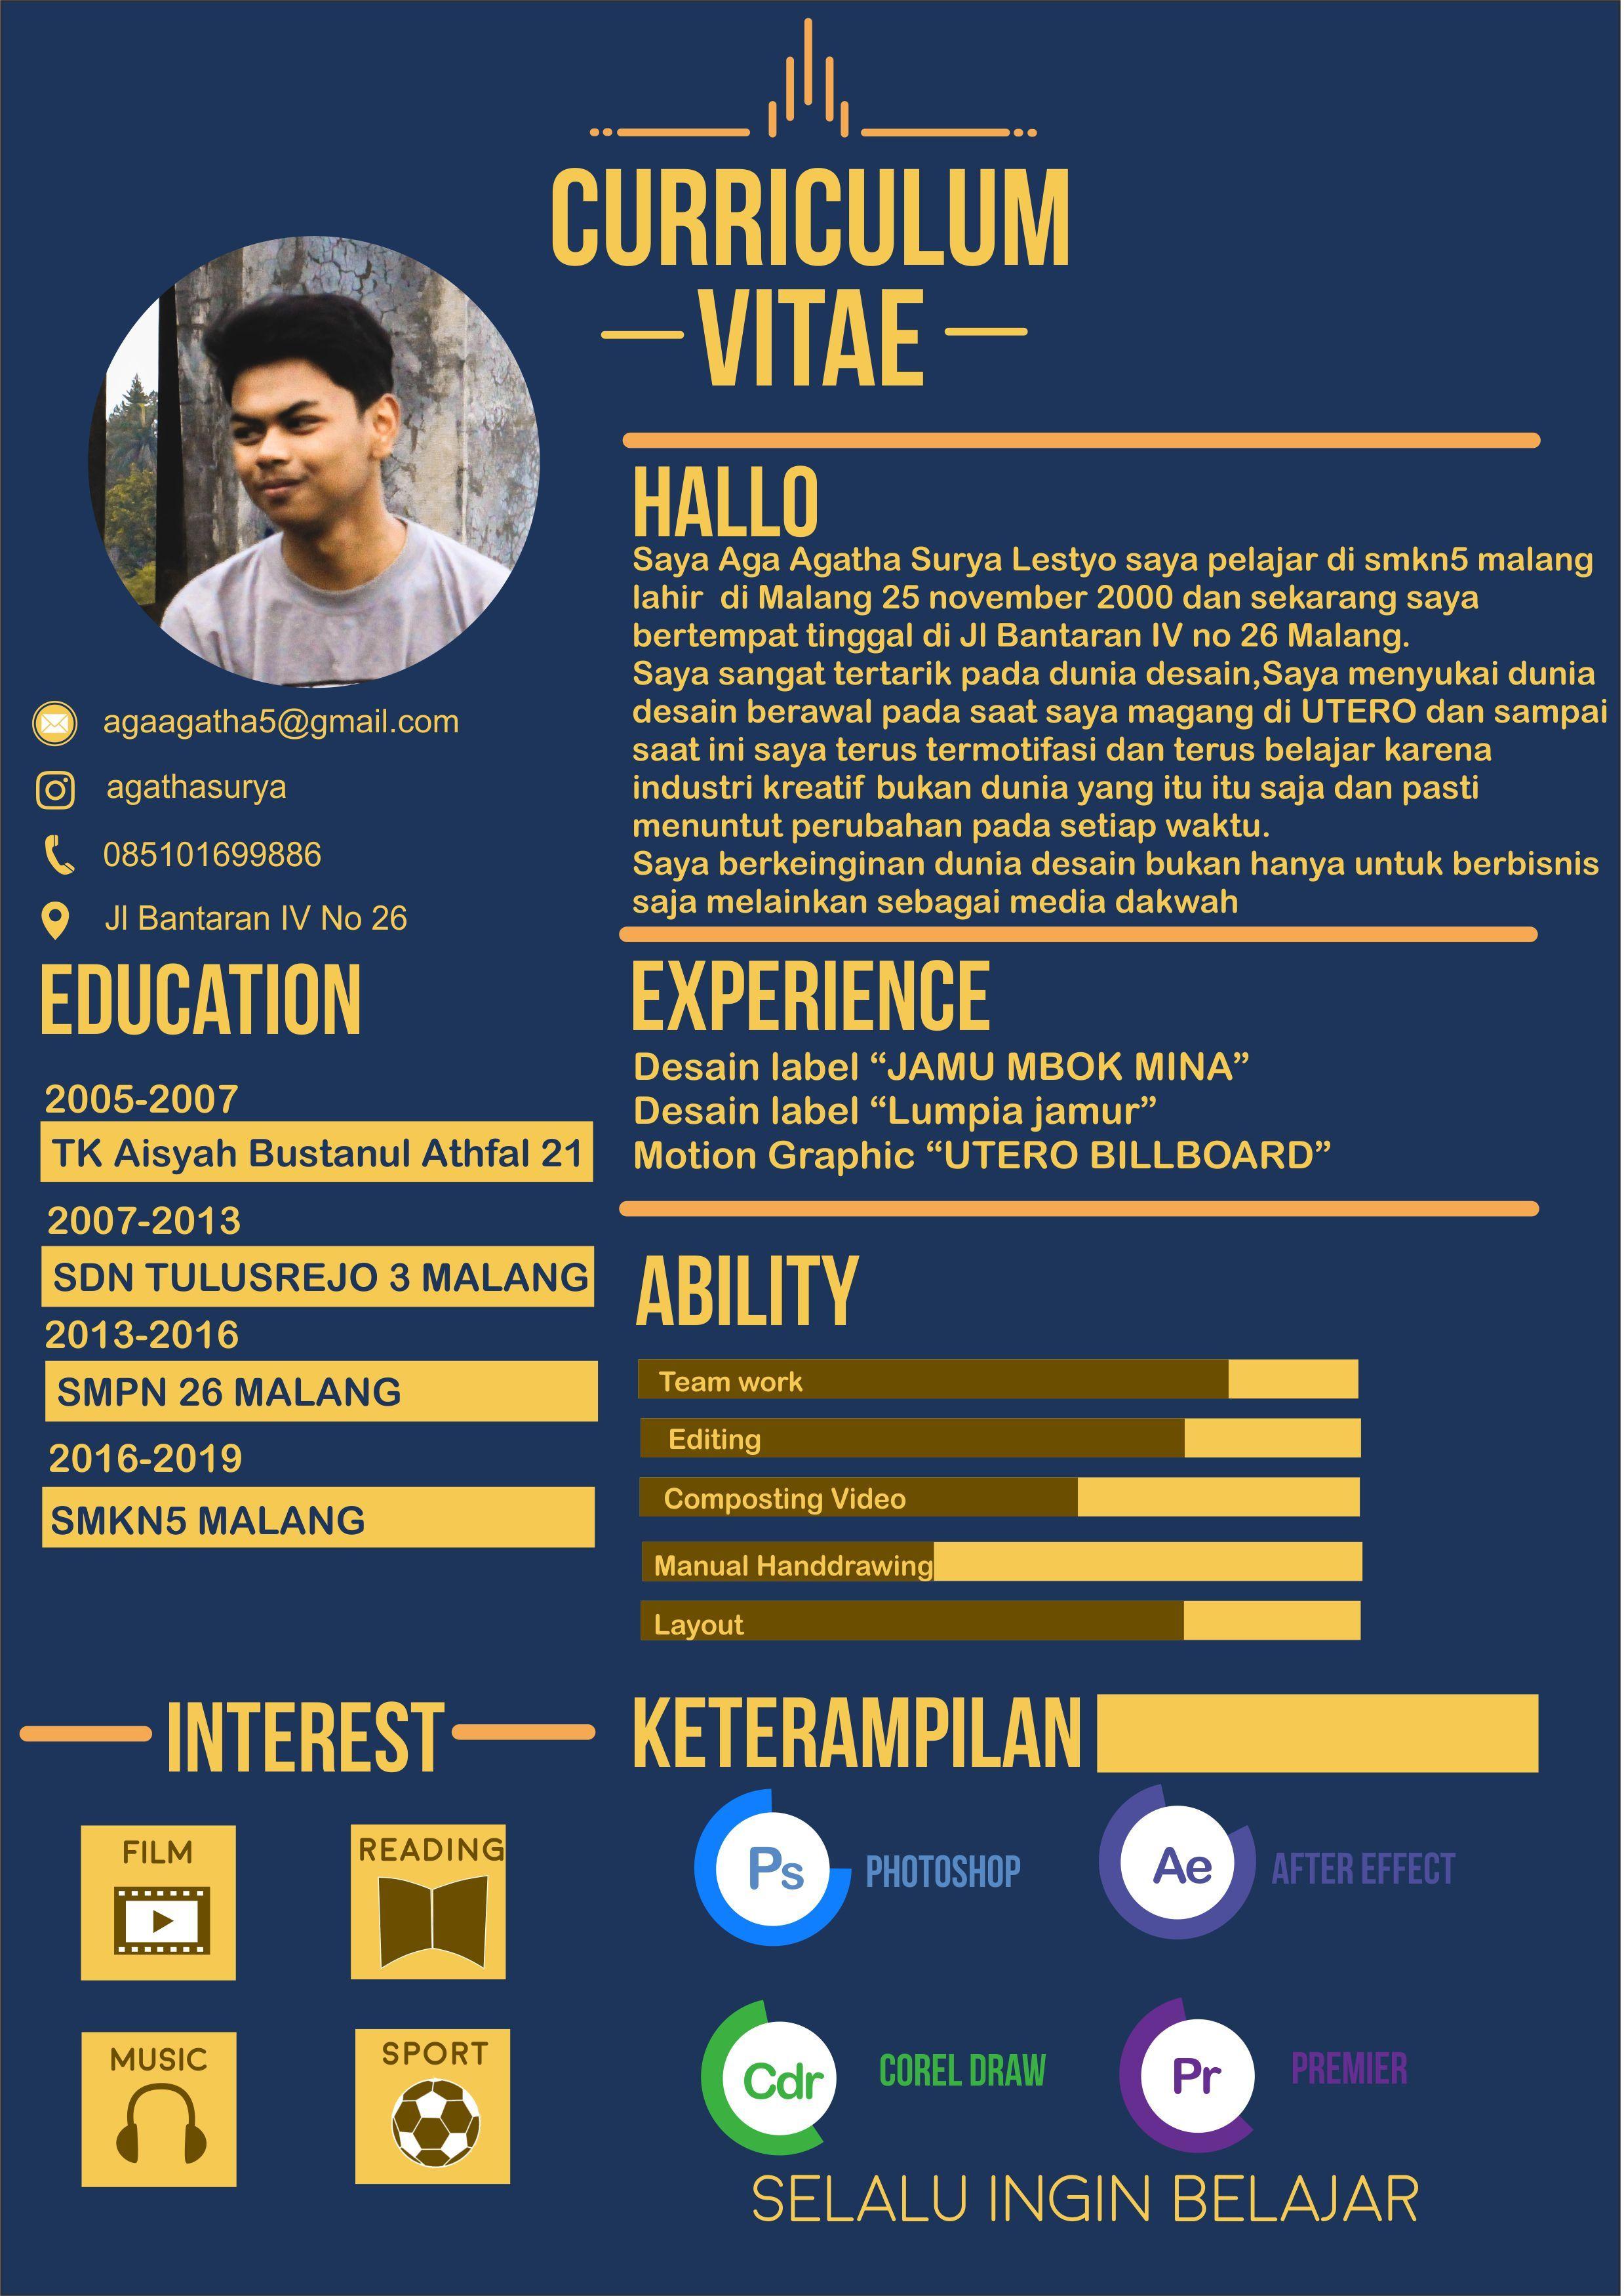 Curiculum Vitae Cv Perkenalan Diri Curriculum Vitae Coreldraw Cv Kreatif Creative Cv Template Desain Resume